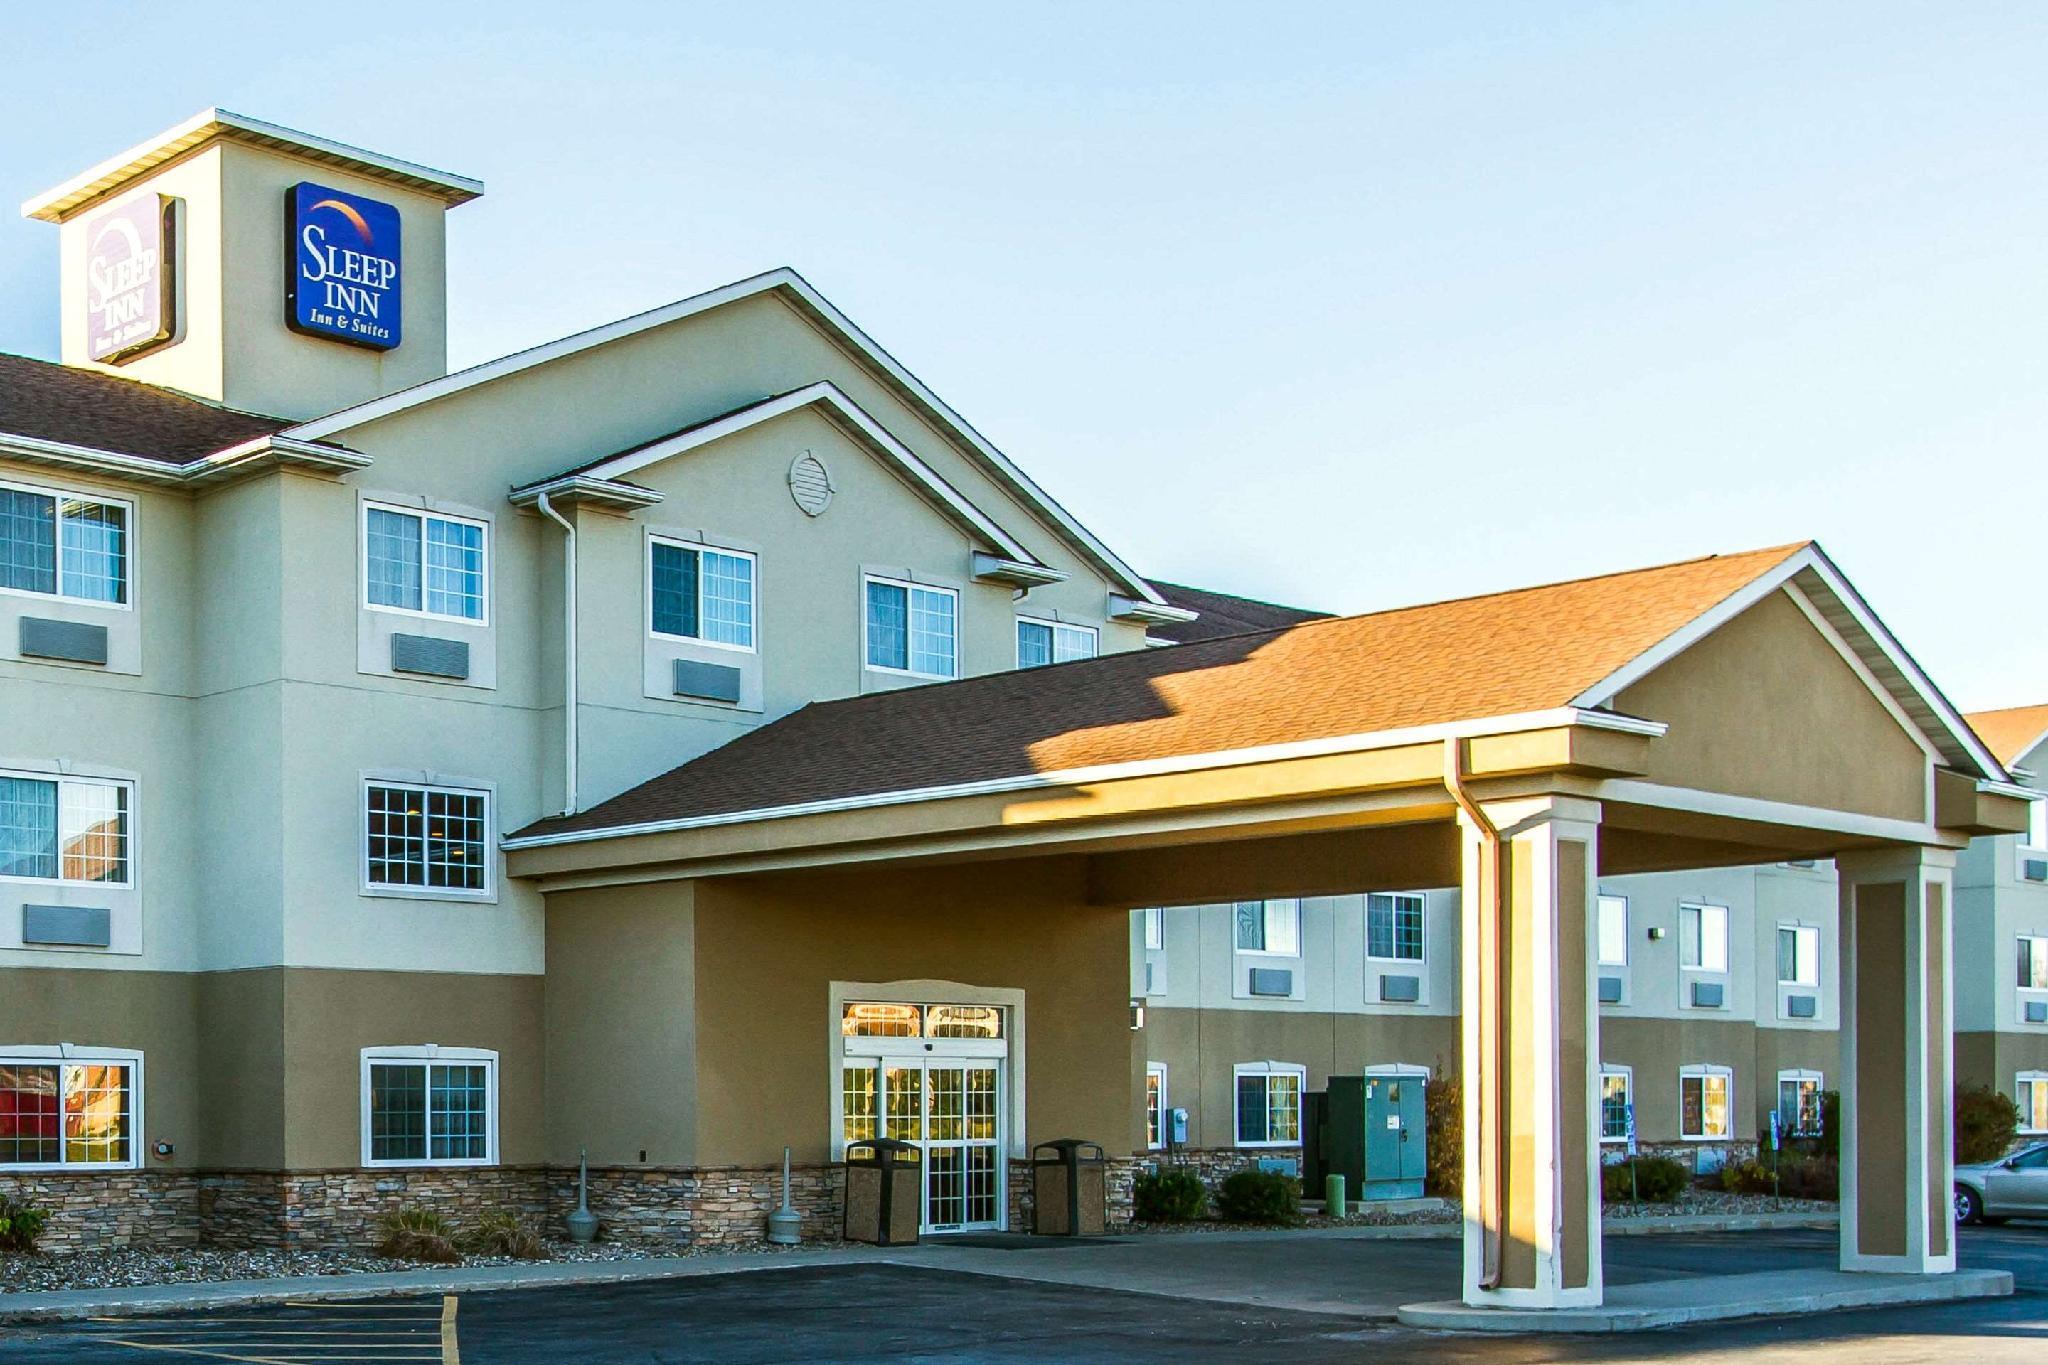 Sleep Inn And Suites Pleasant Hill